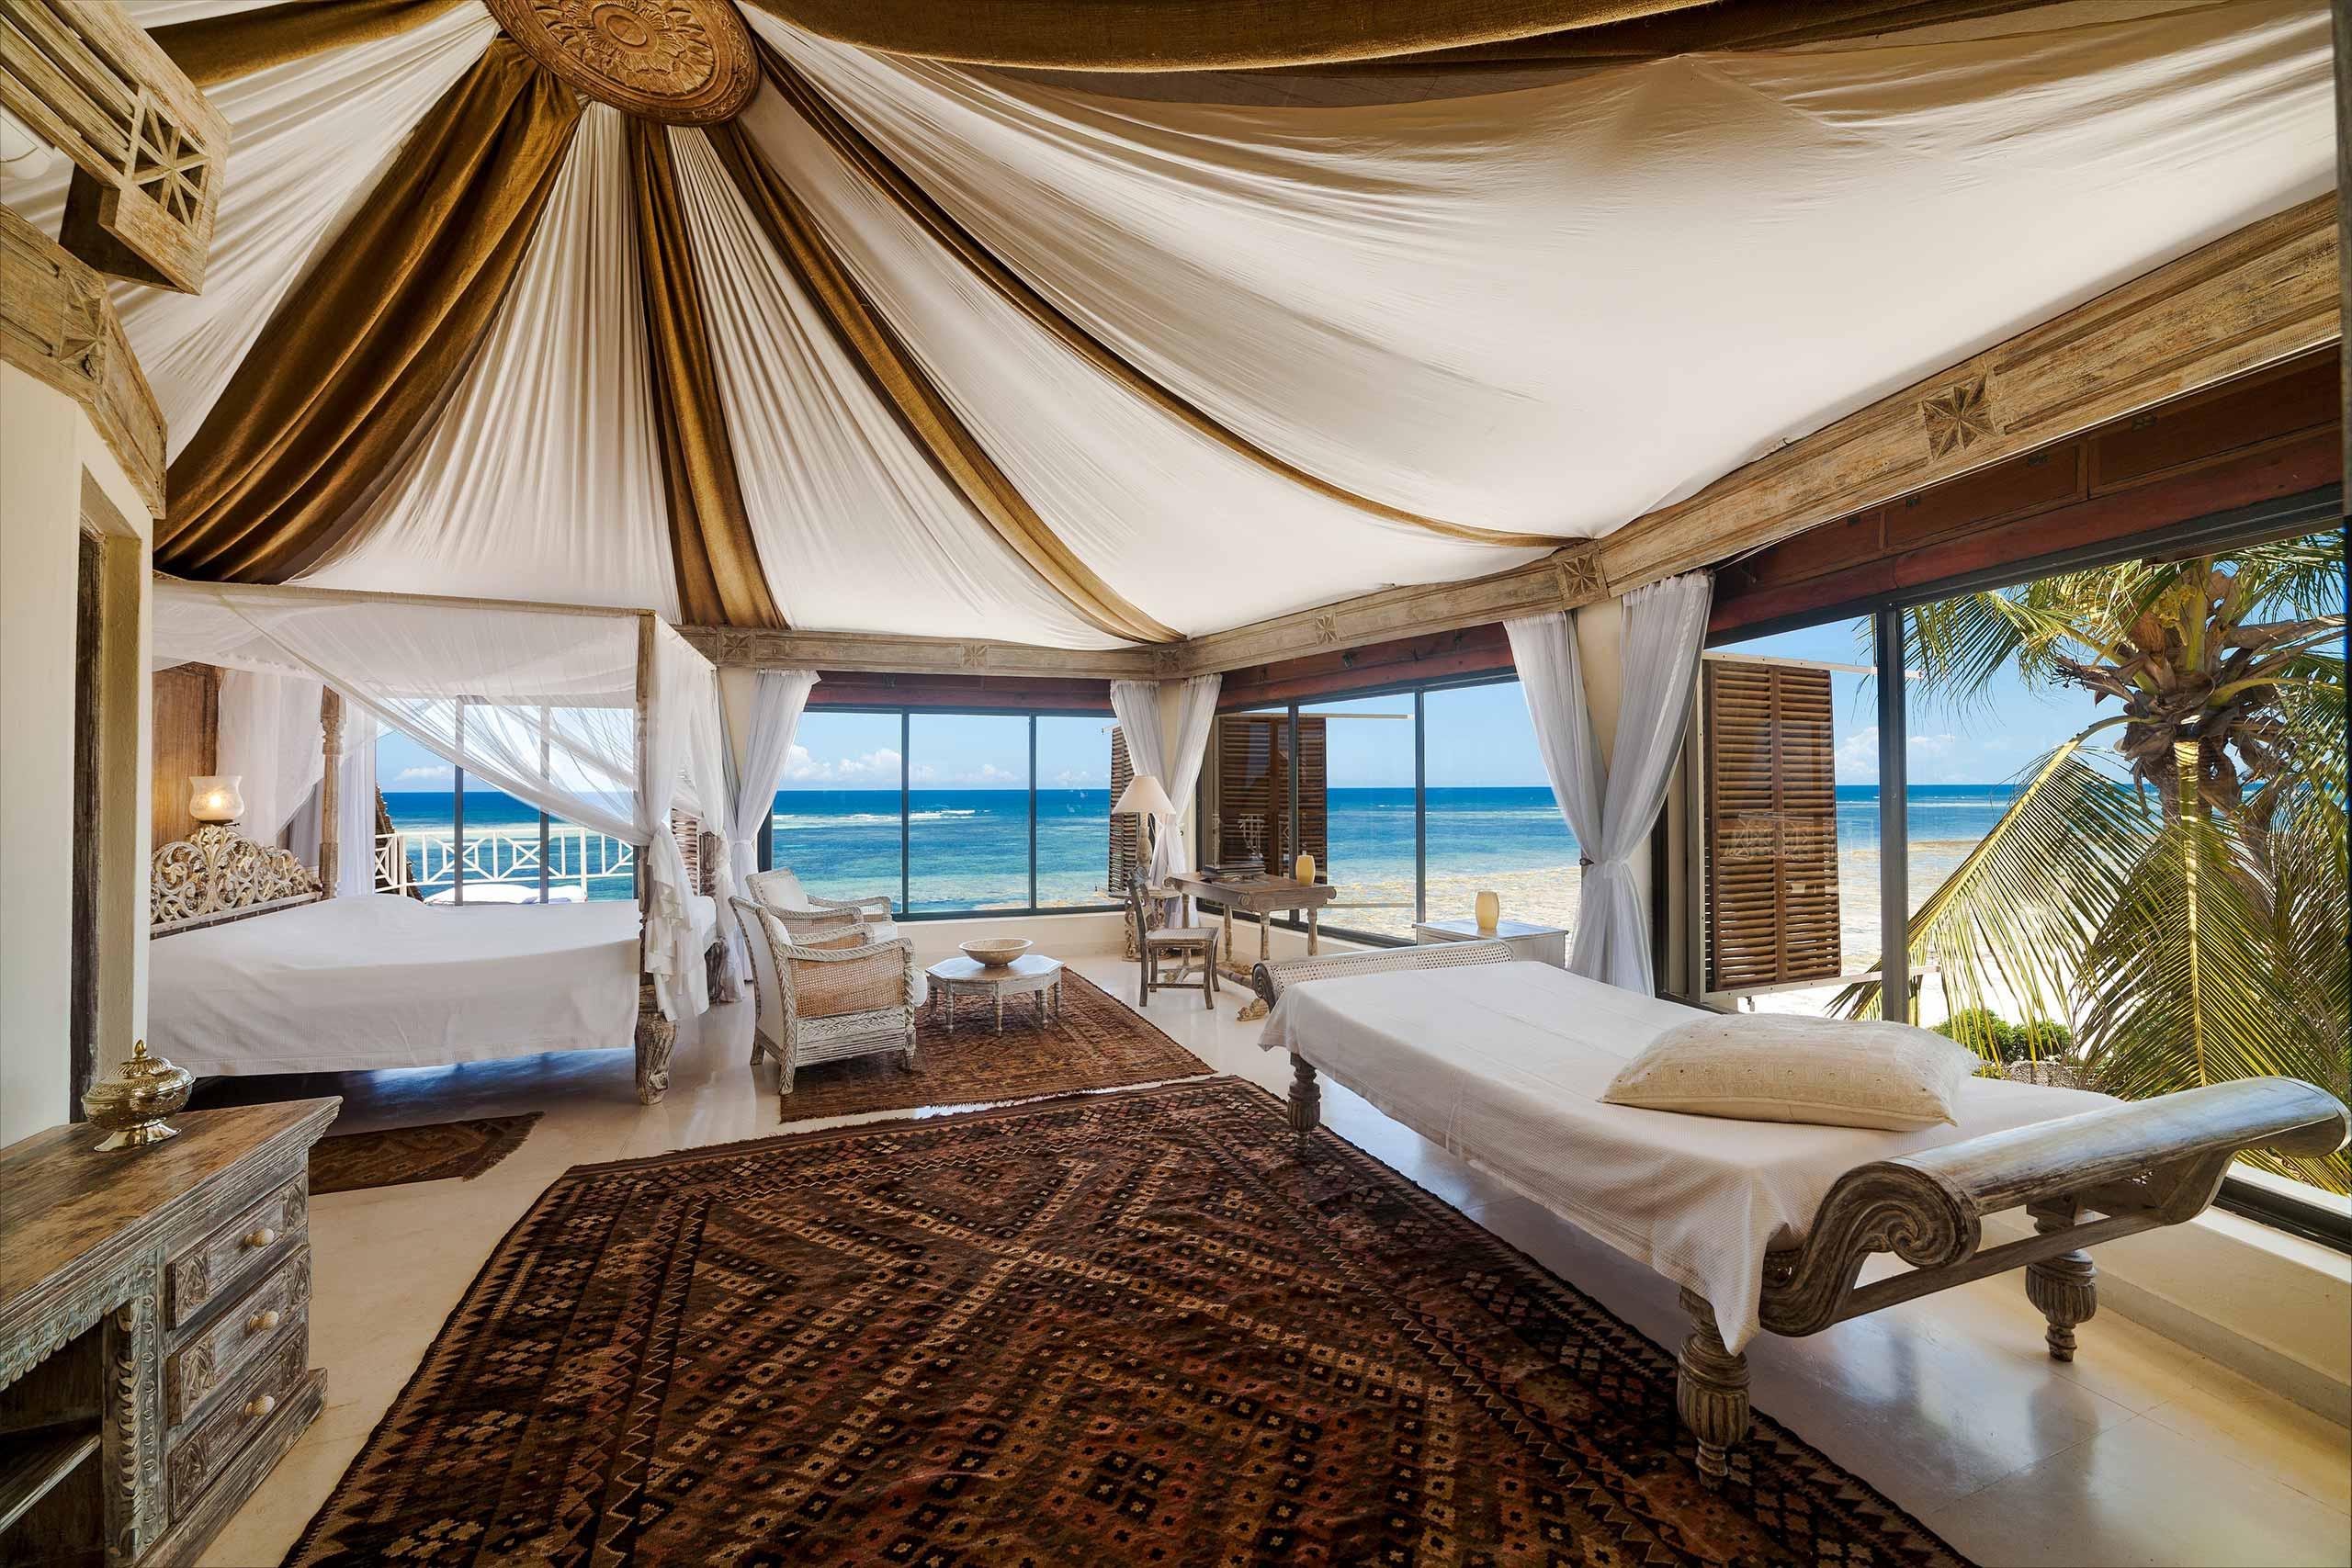 enkosi-africa-safari-kenia-alfajiri-villas-cliff-bedroom-beach